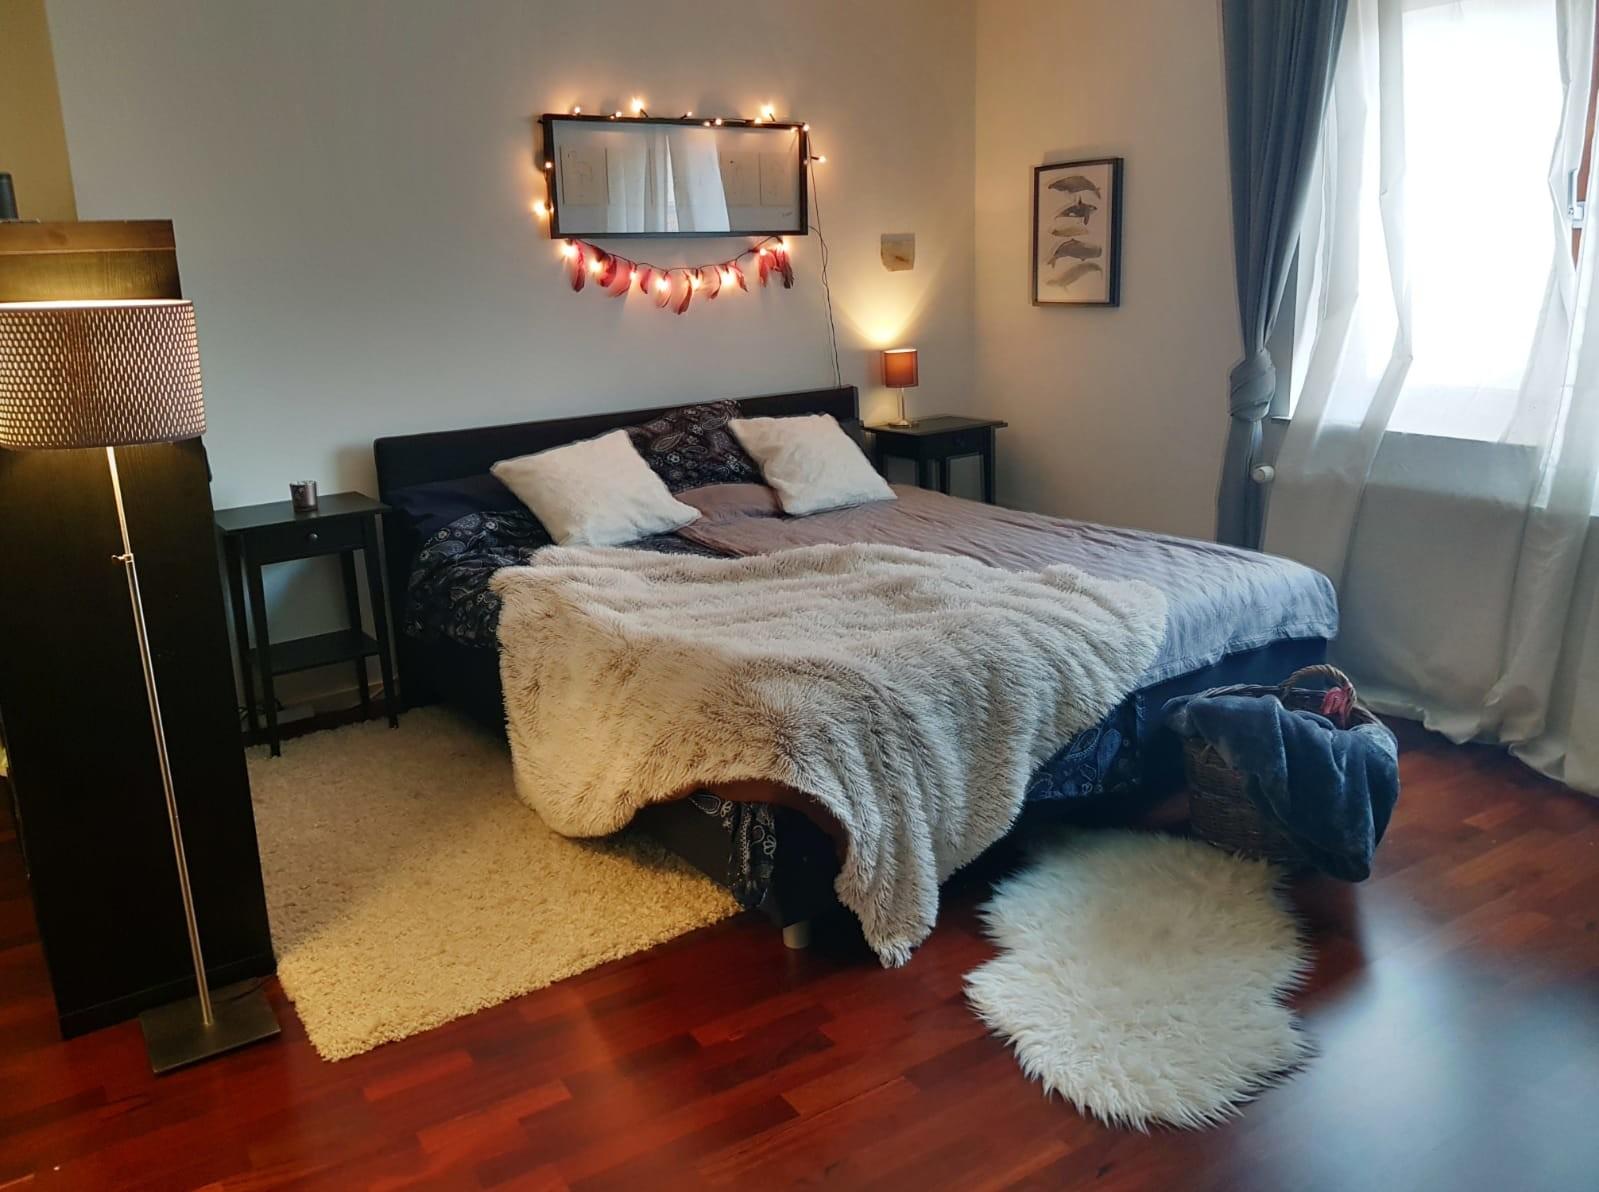 Whole luxury flat for 2-4 People incl. Bathroom,Kitchen,Floor he